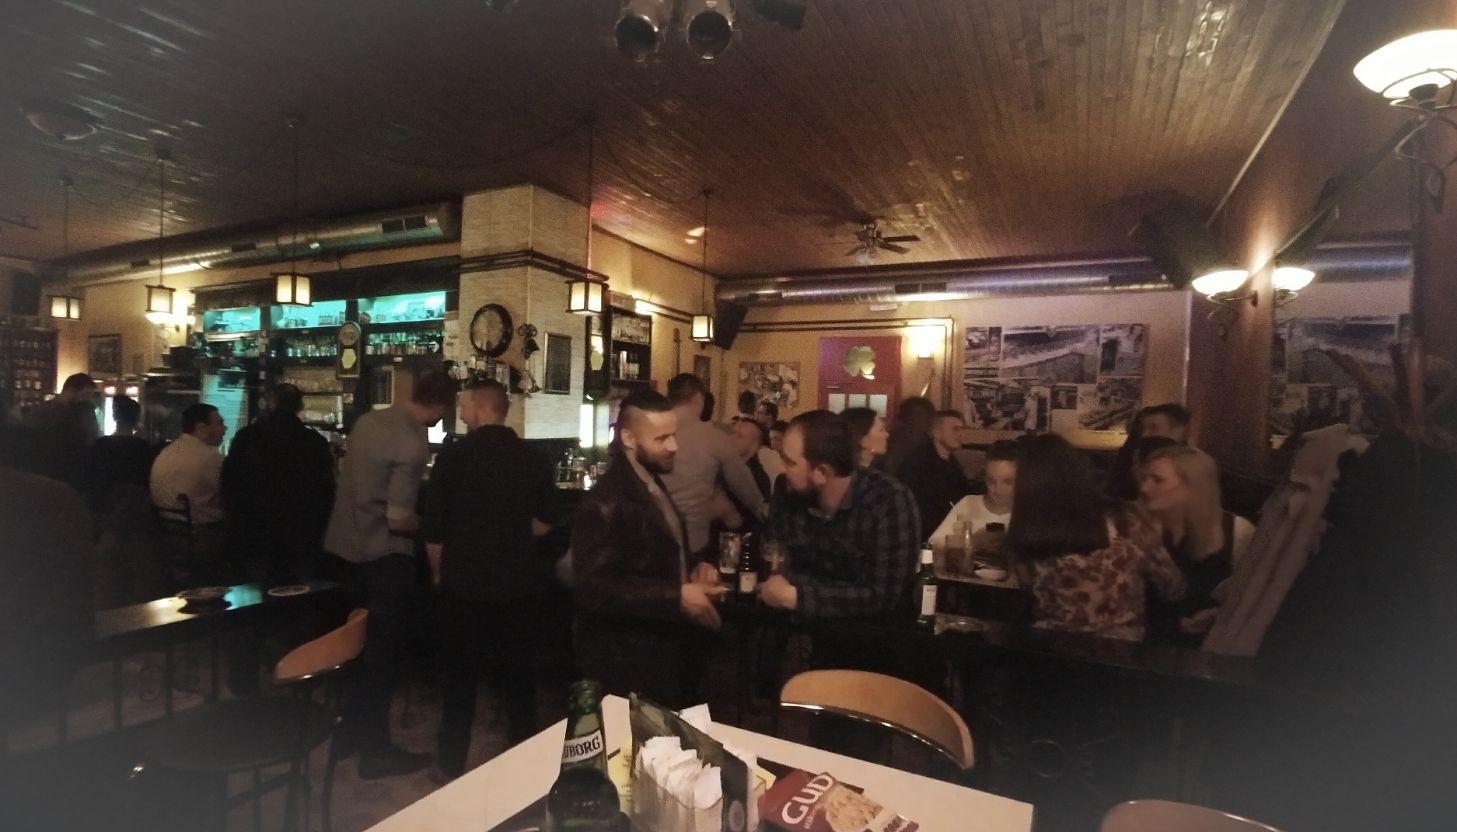 Whiskey bar18.11.2017